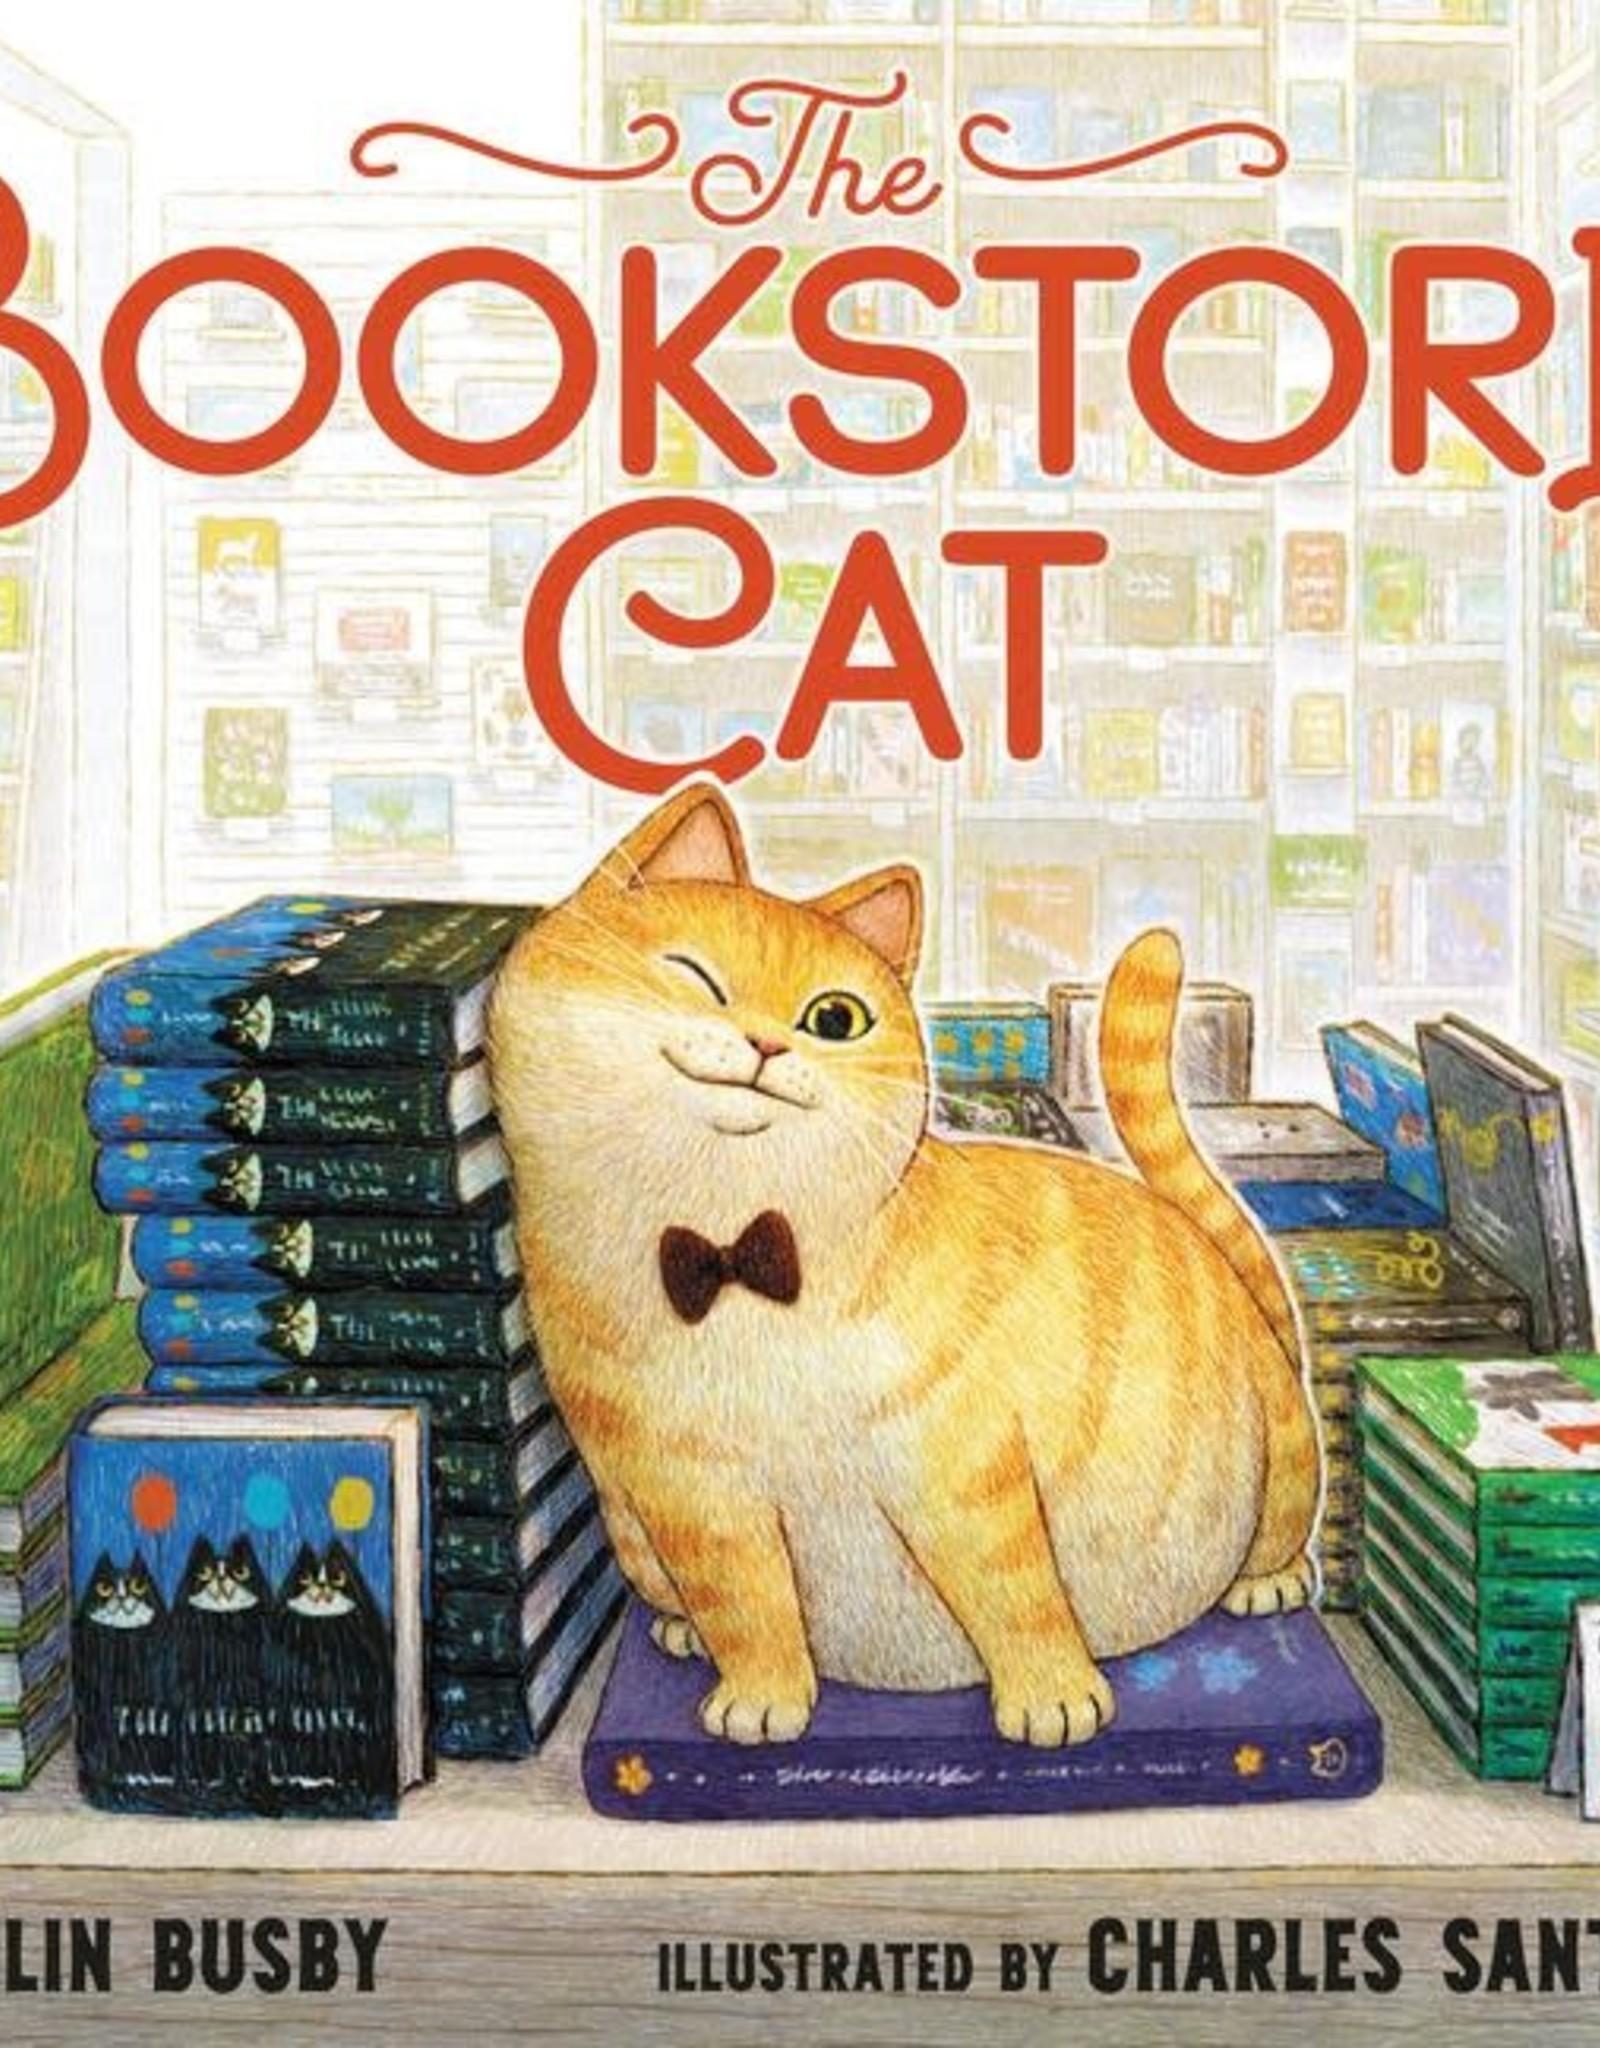 Harper Collins Bookstore Cat